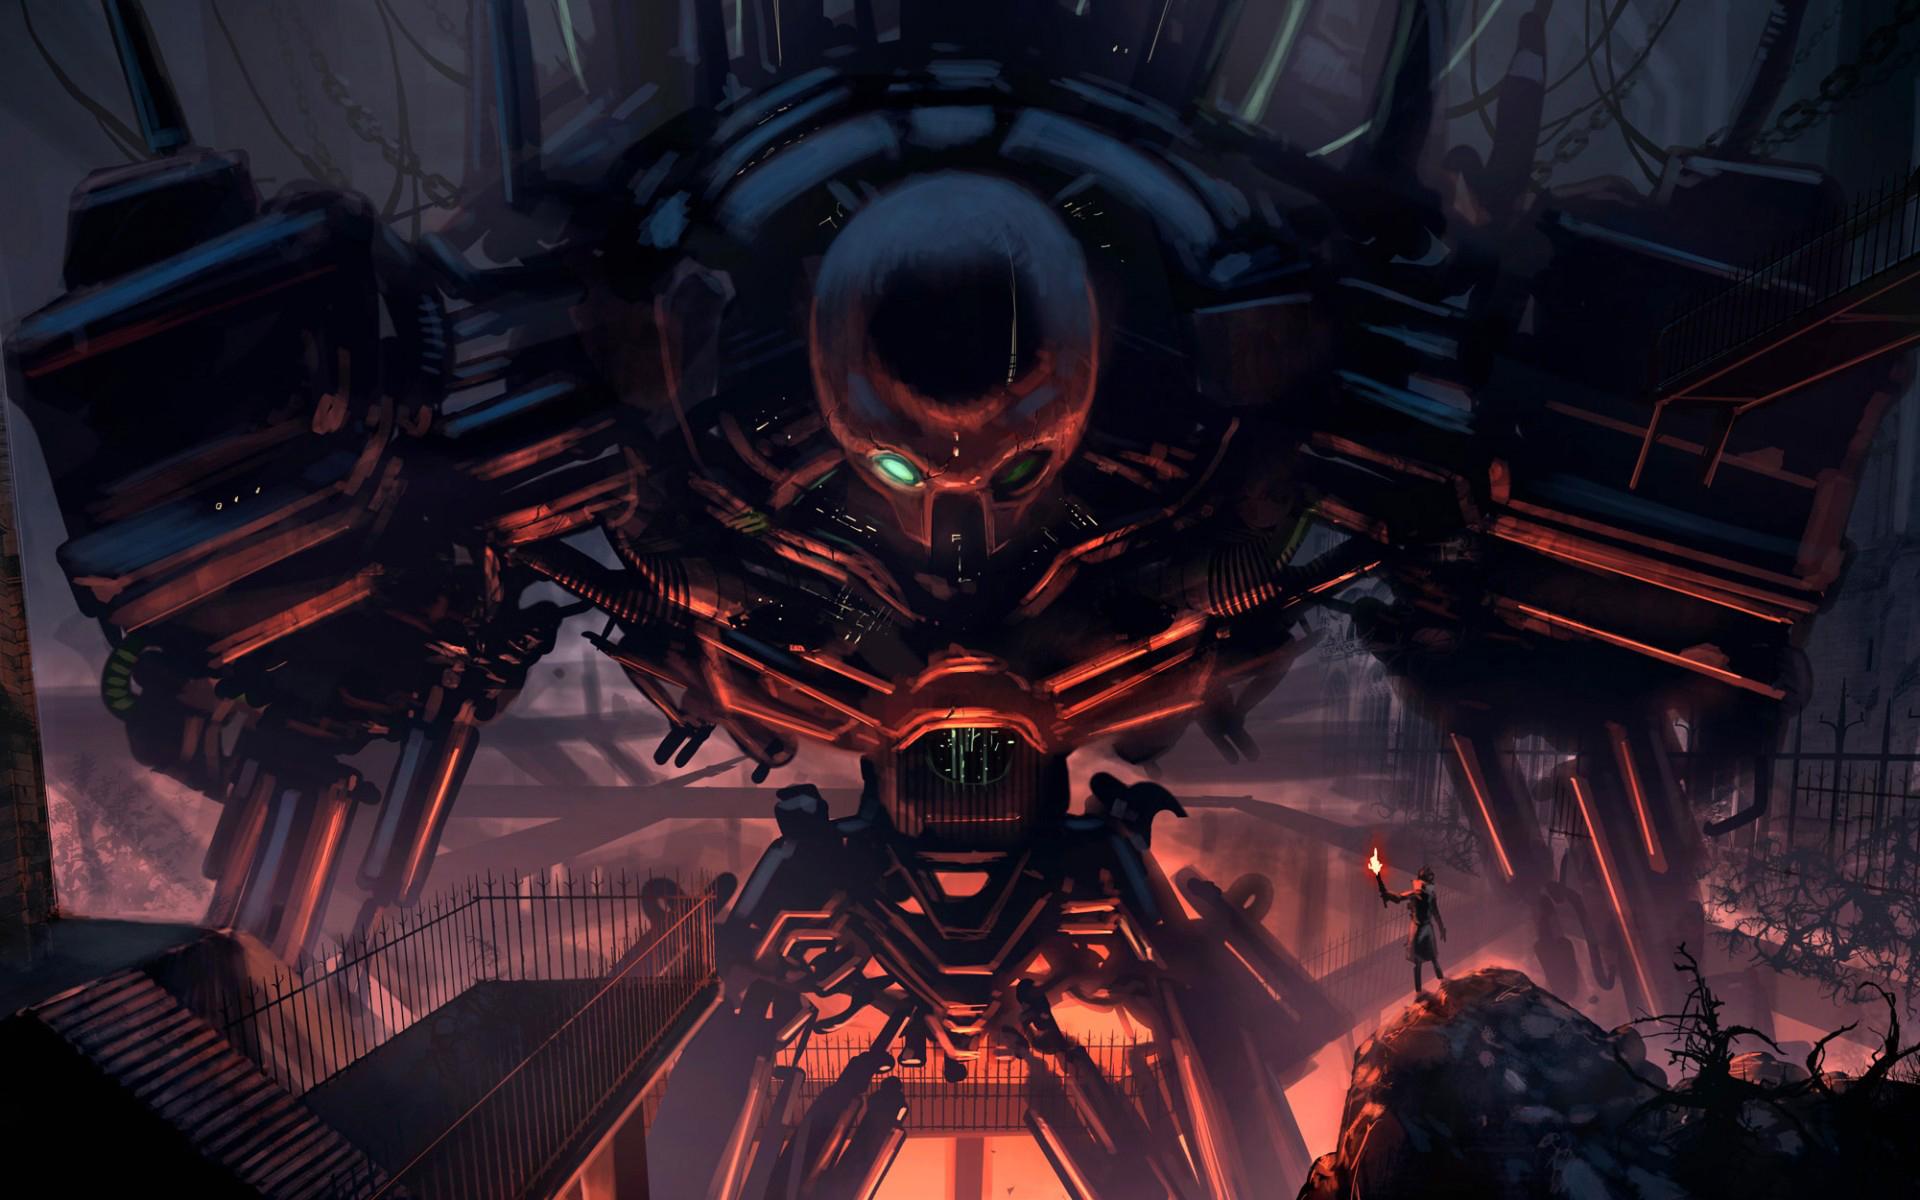 Картинки из аниме фантастика роботы